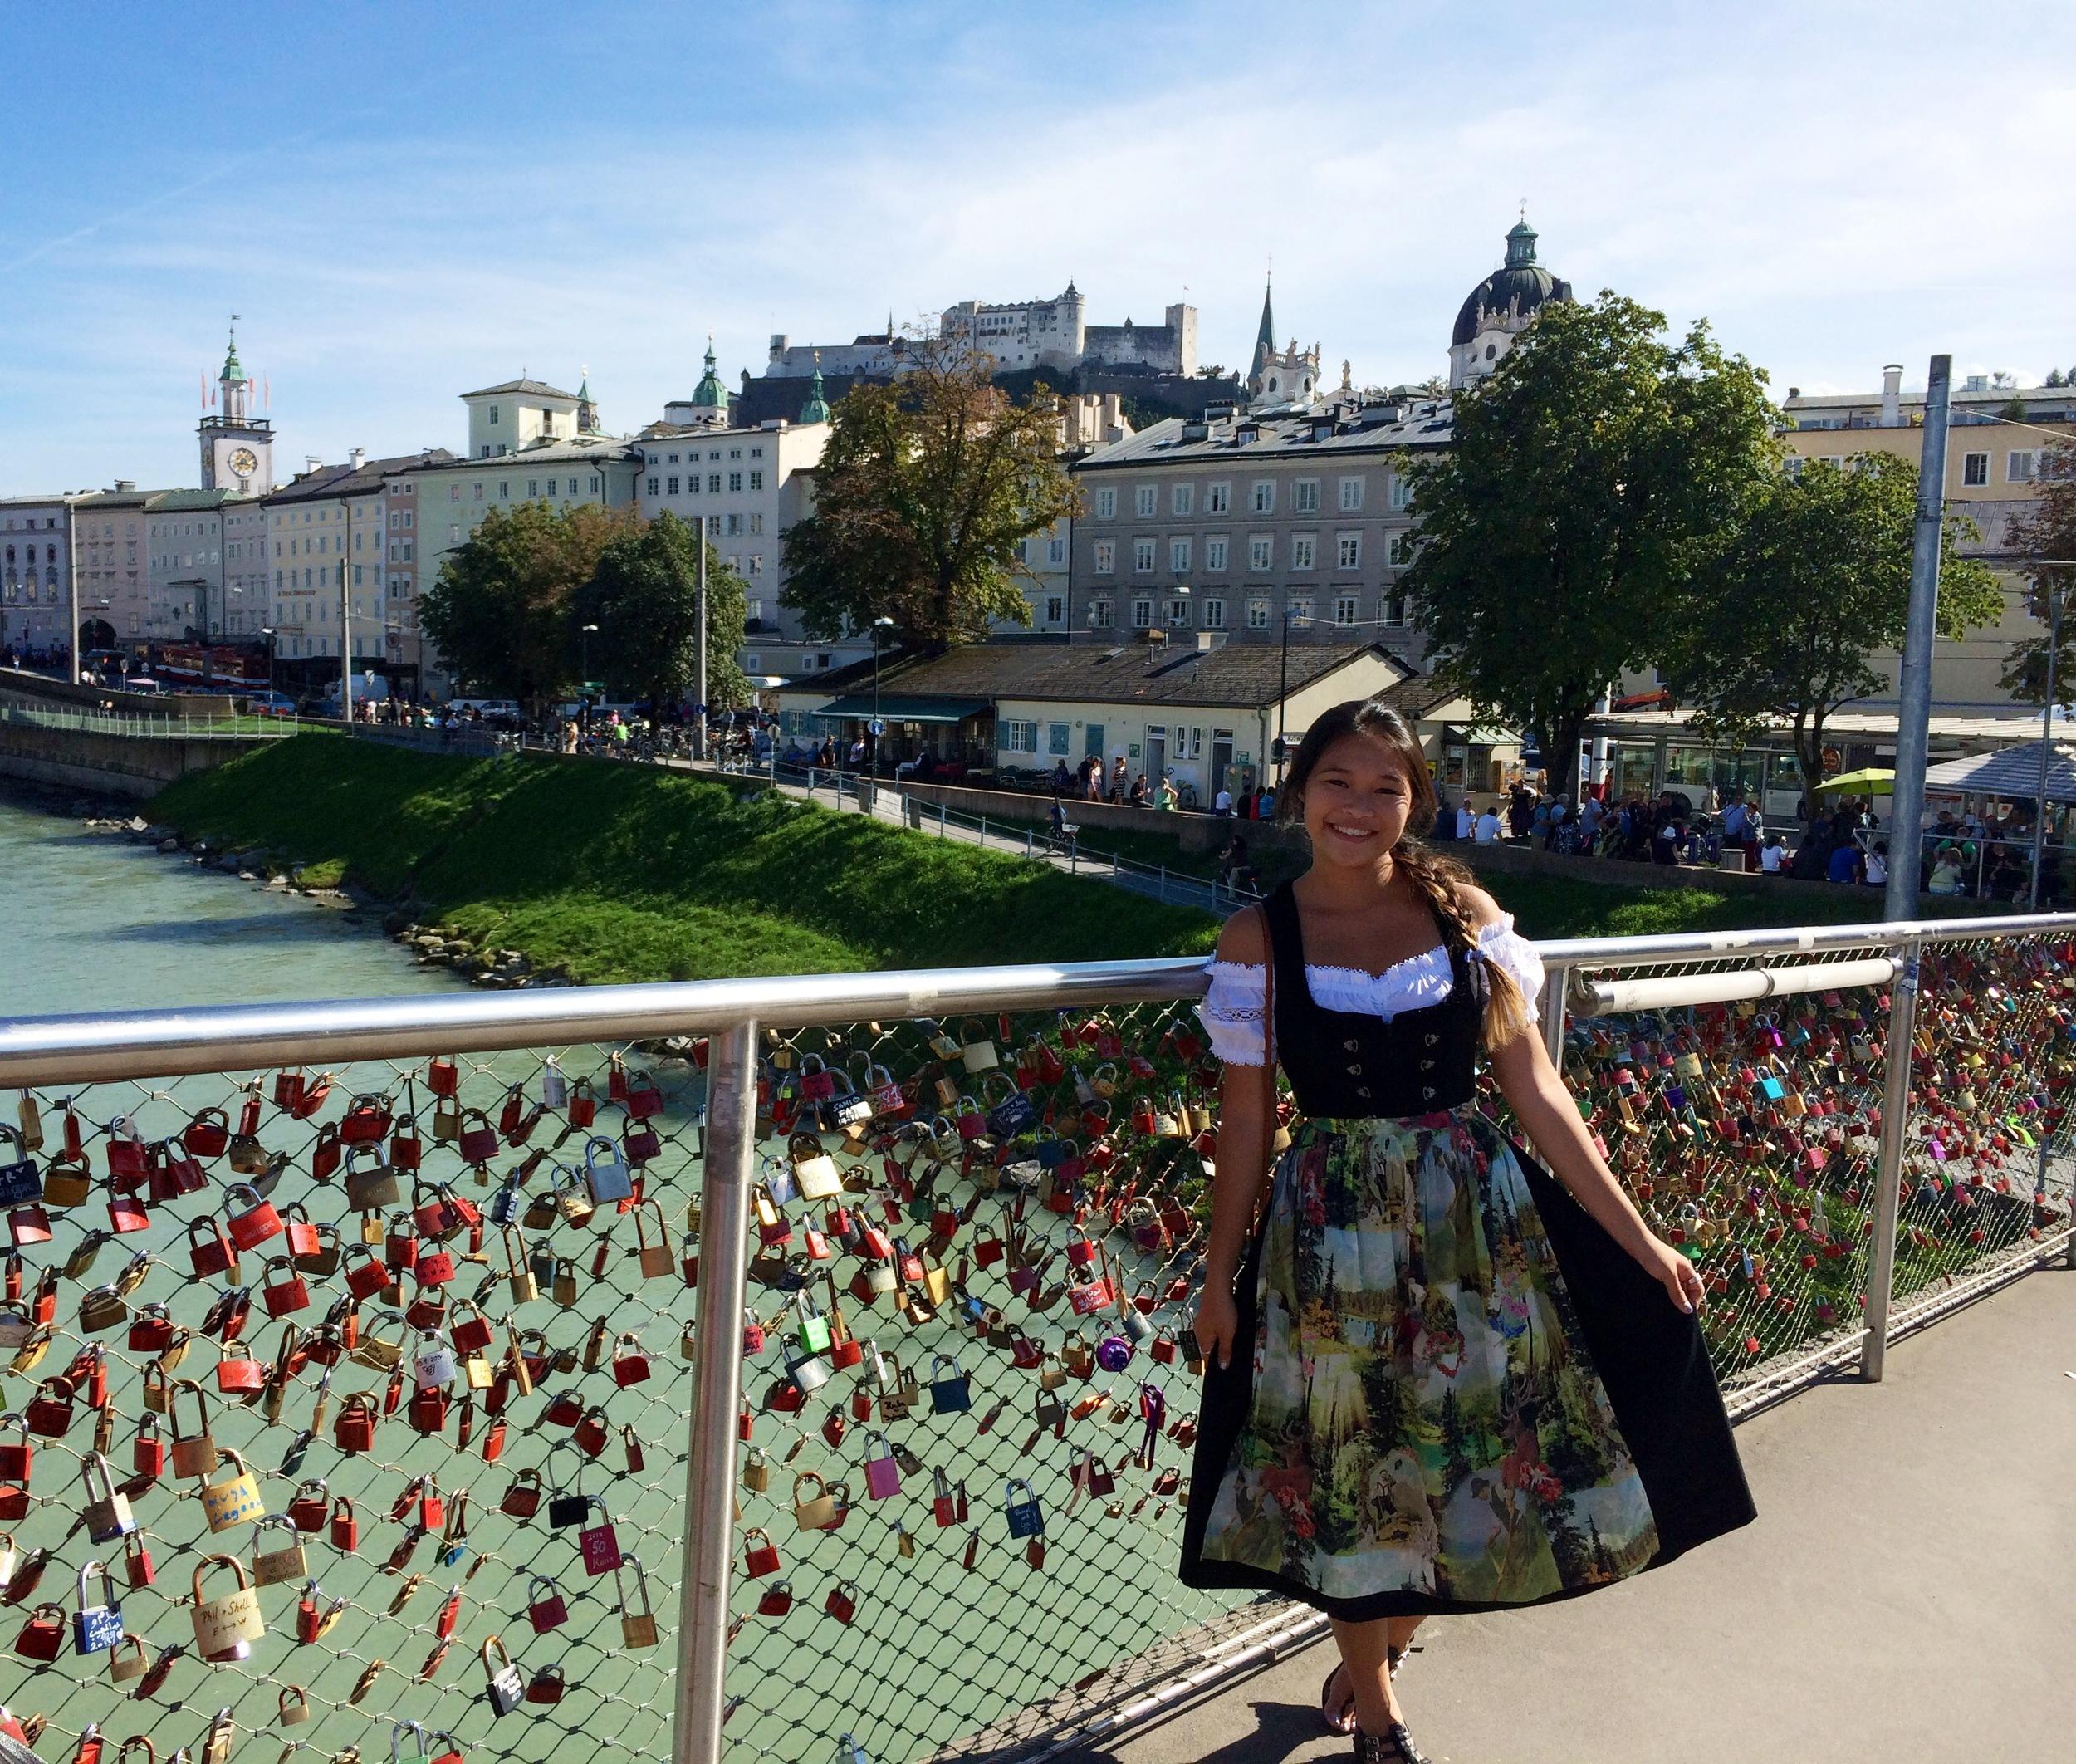 Lovelock bridge, Salzburg, Austria